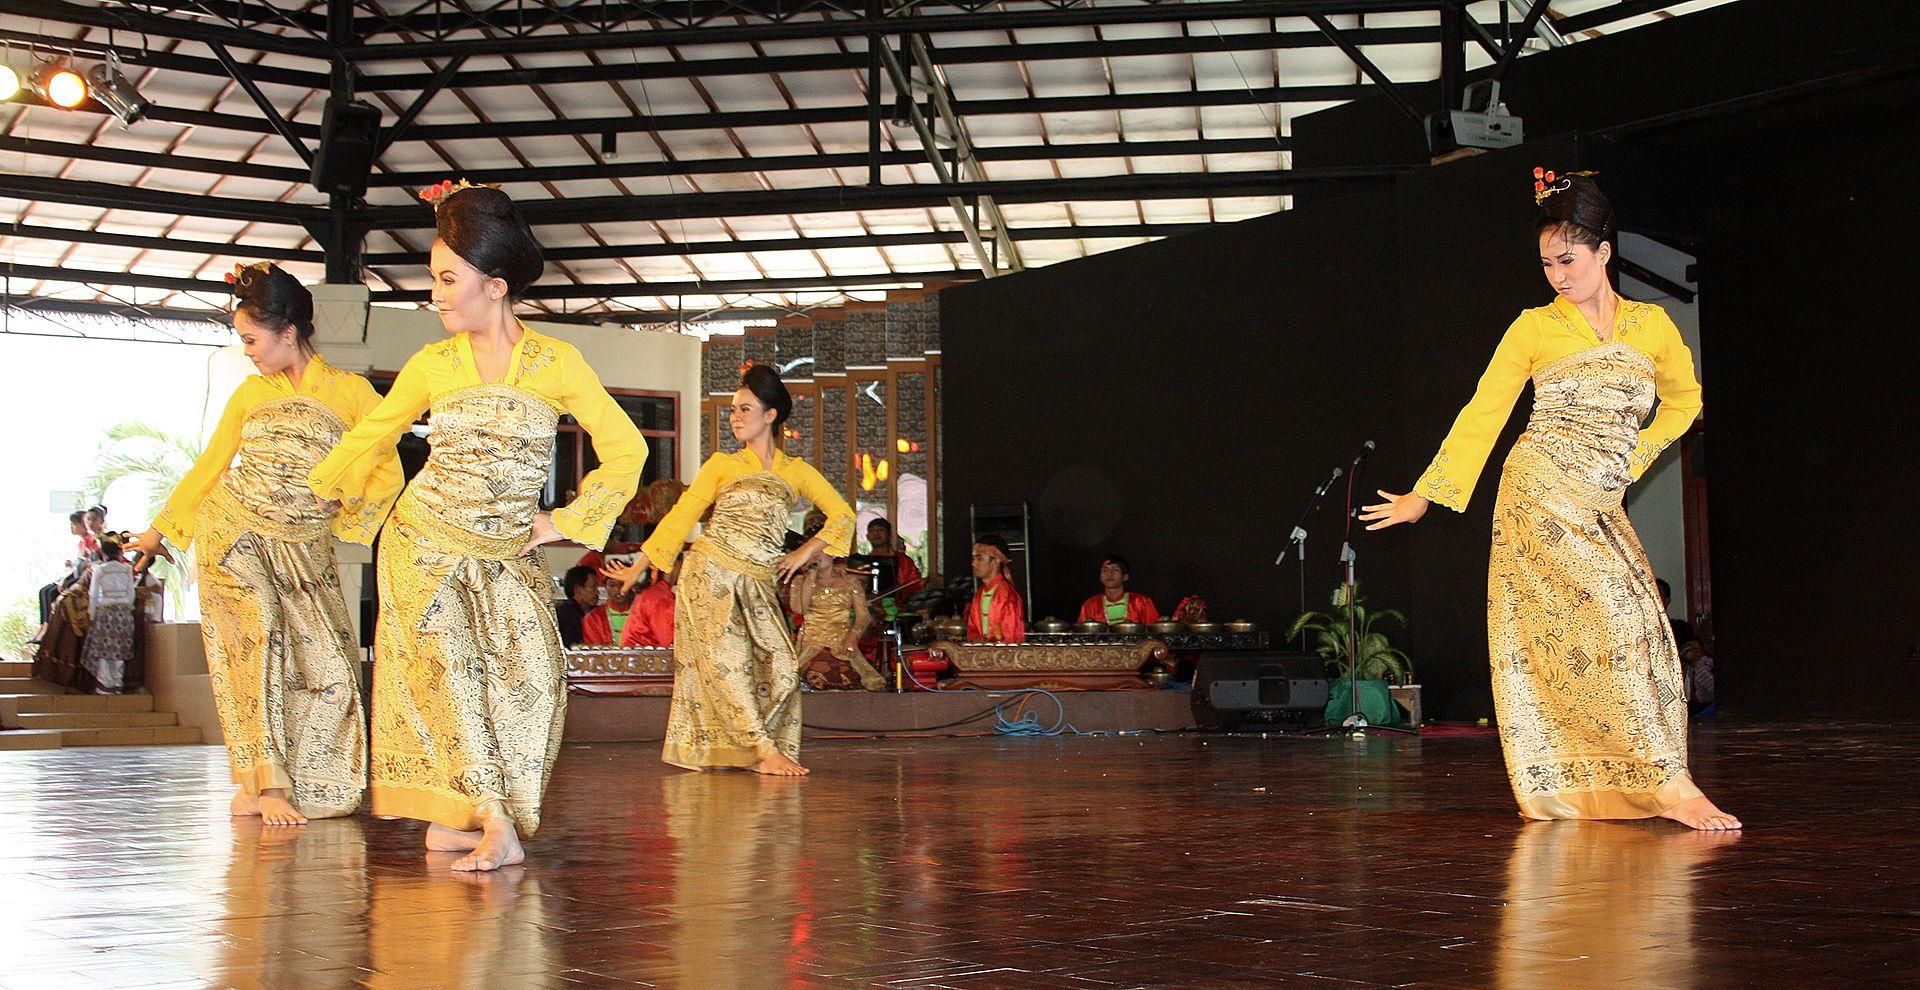 Tari Jaipongan berasal dari daerah Jawa Barat